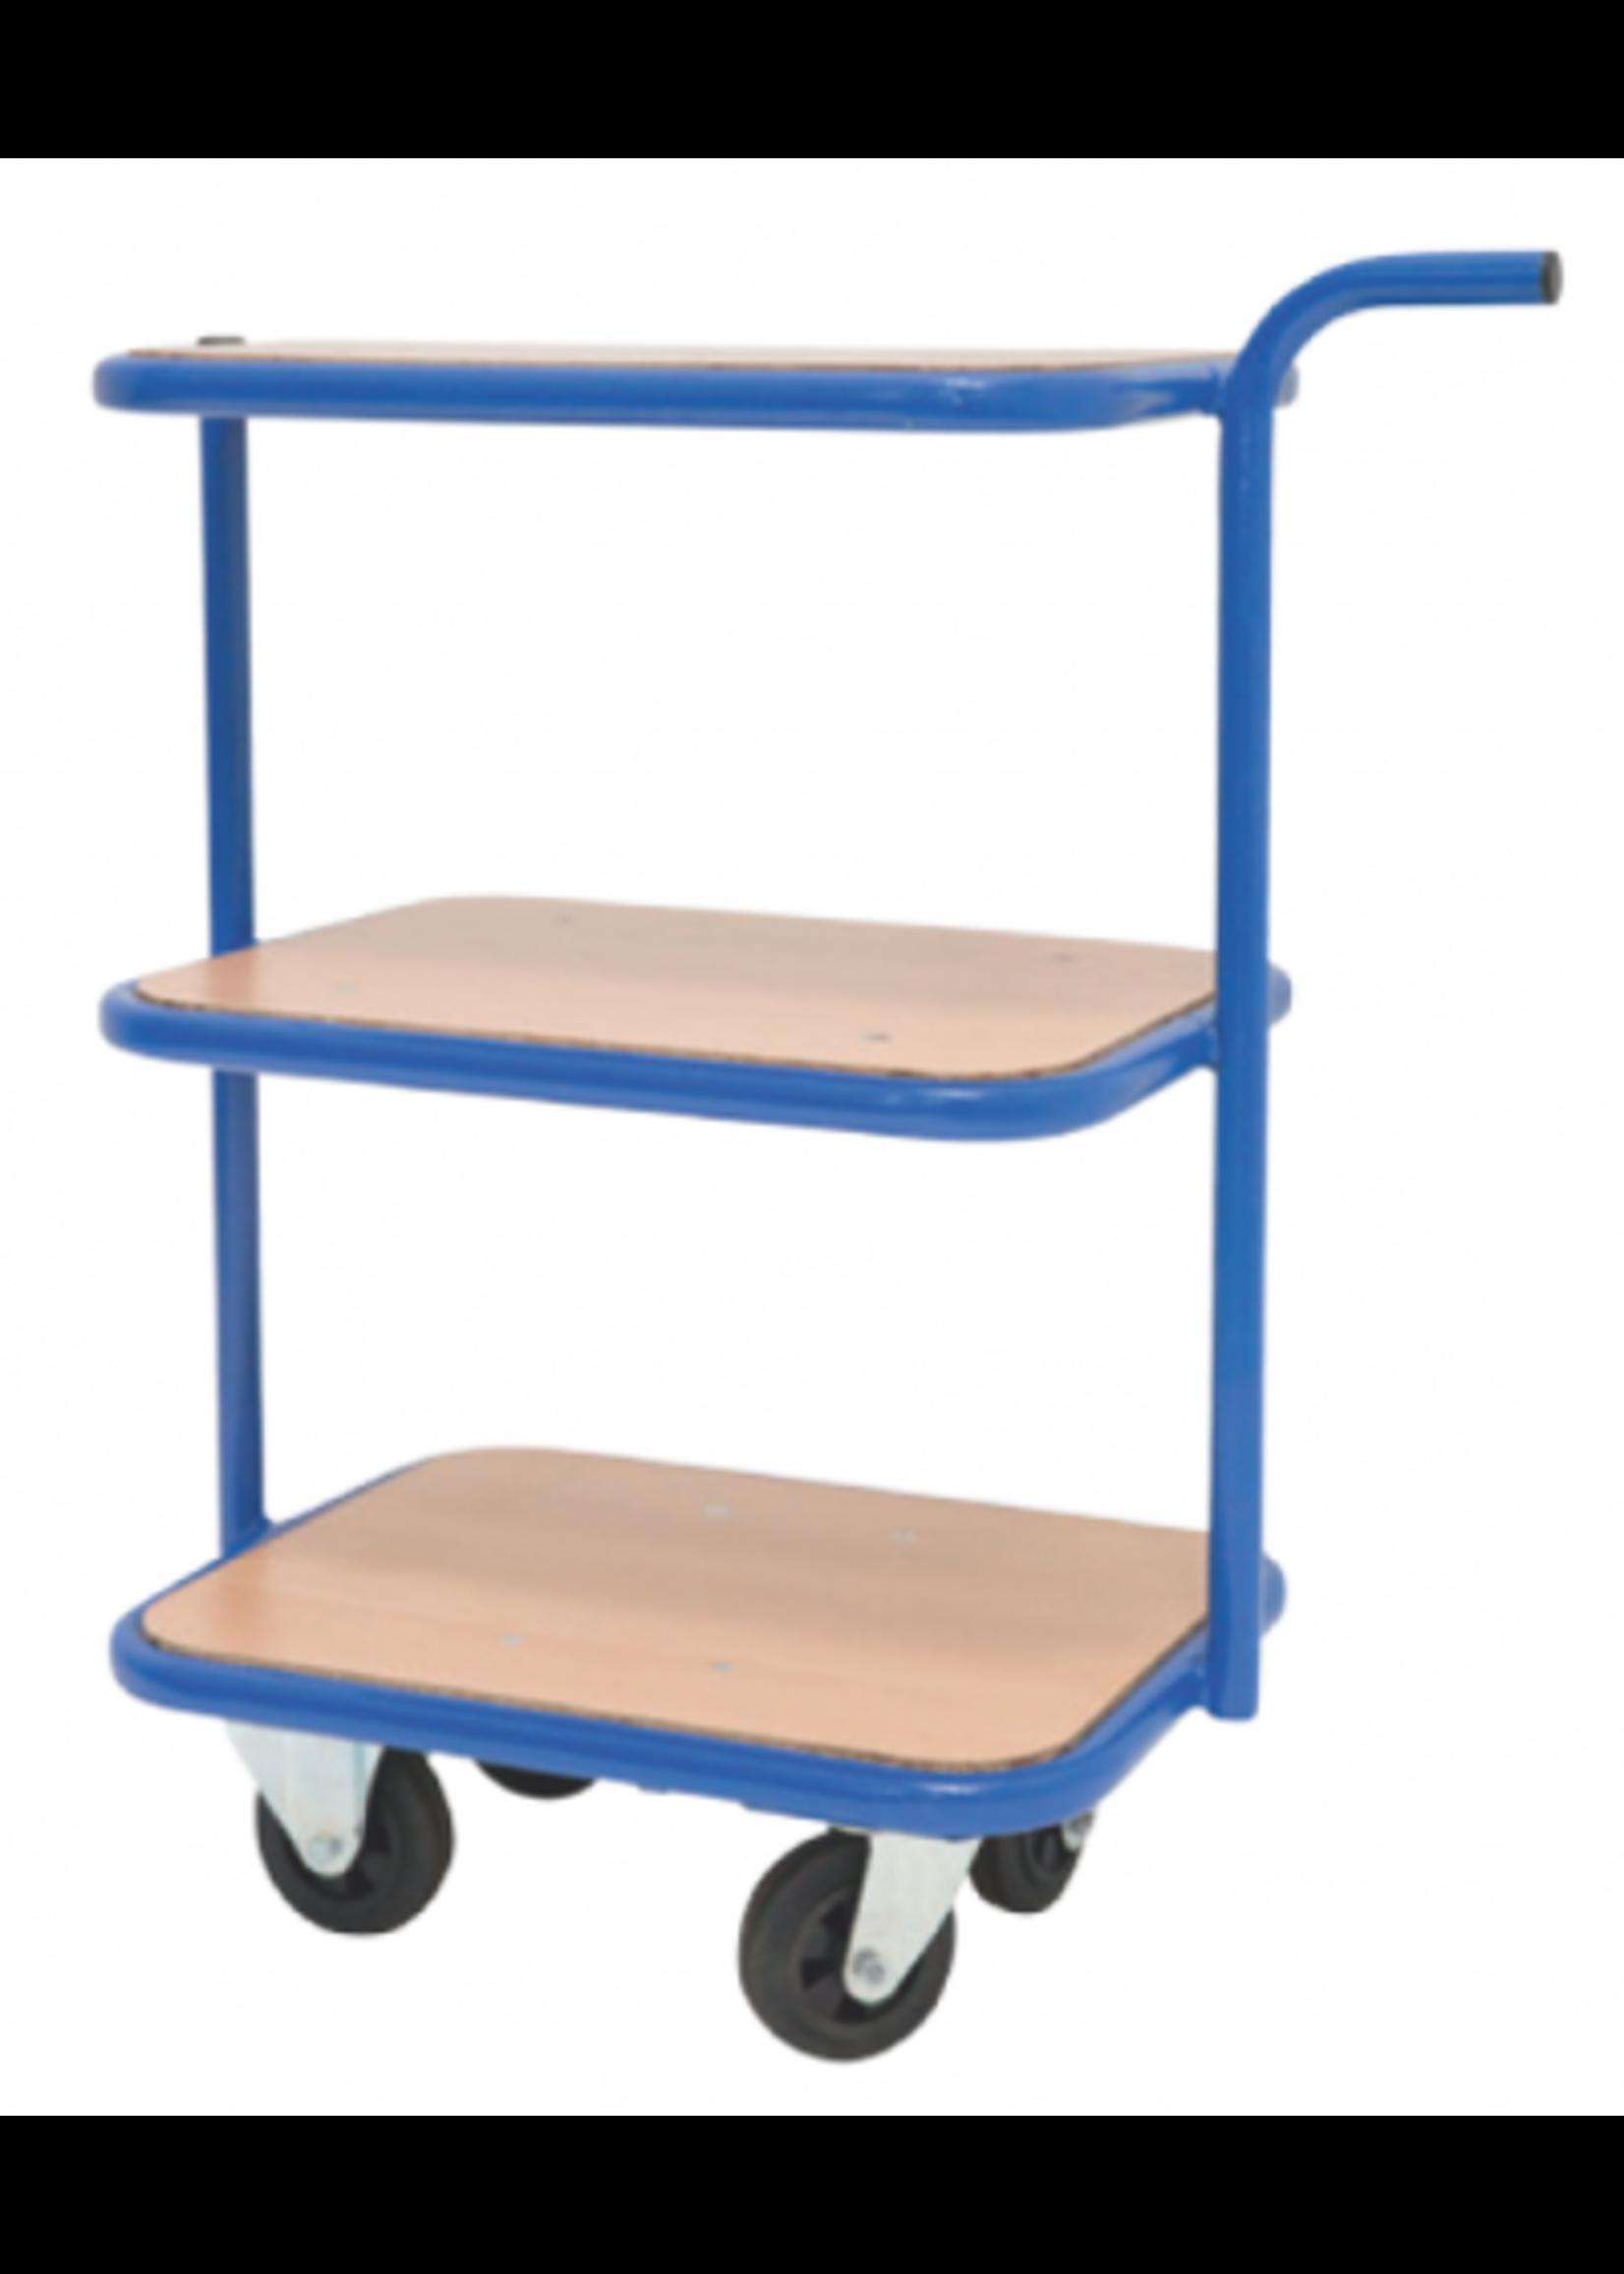 Etagewagen met 3 niveau's en speciaal klein oppervlak